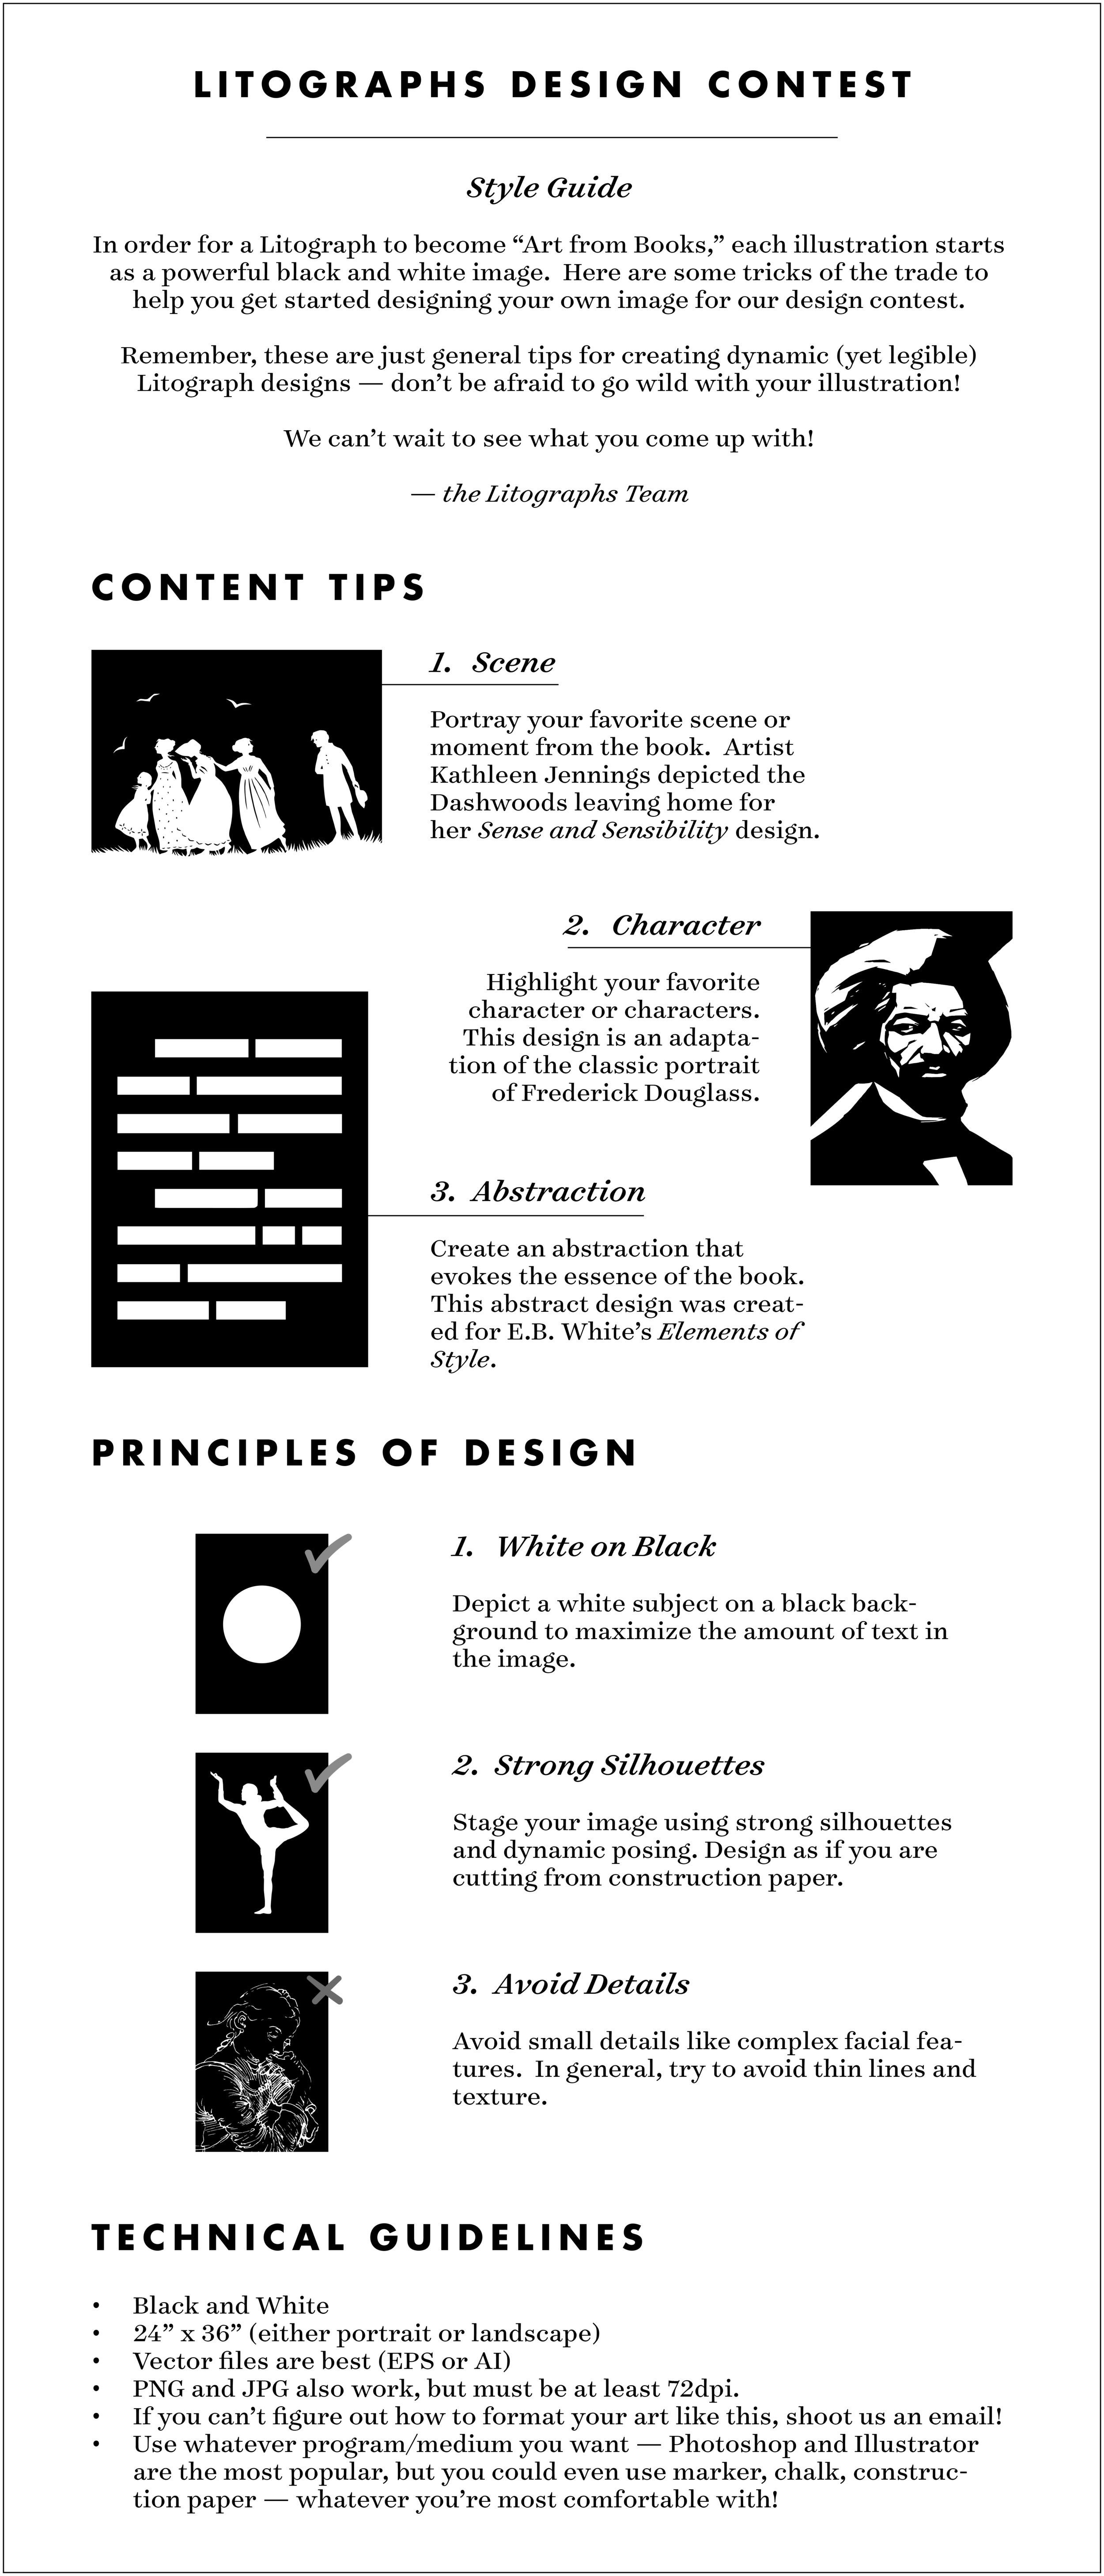 Litographs Design Contest Style Guide.jpg